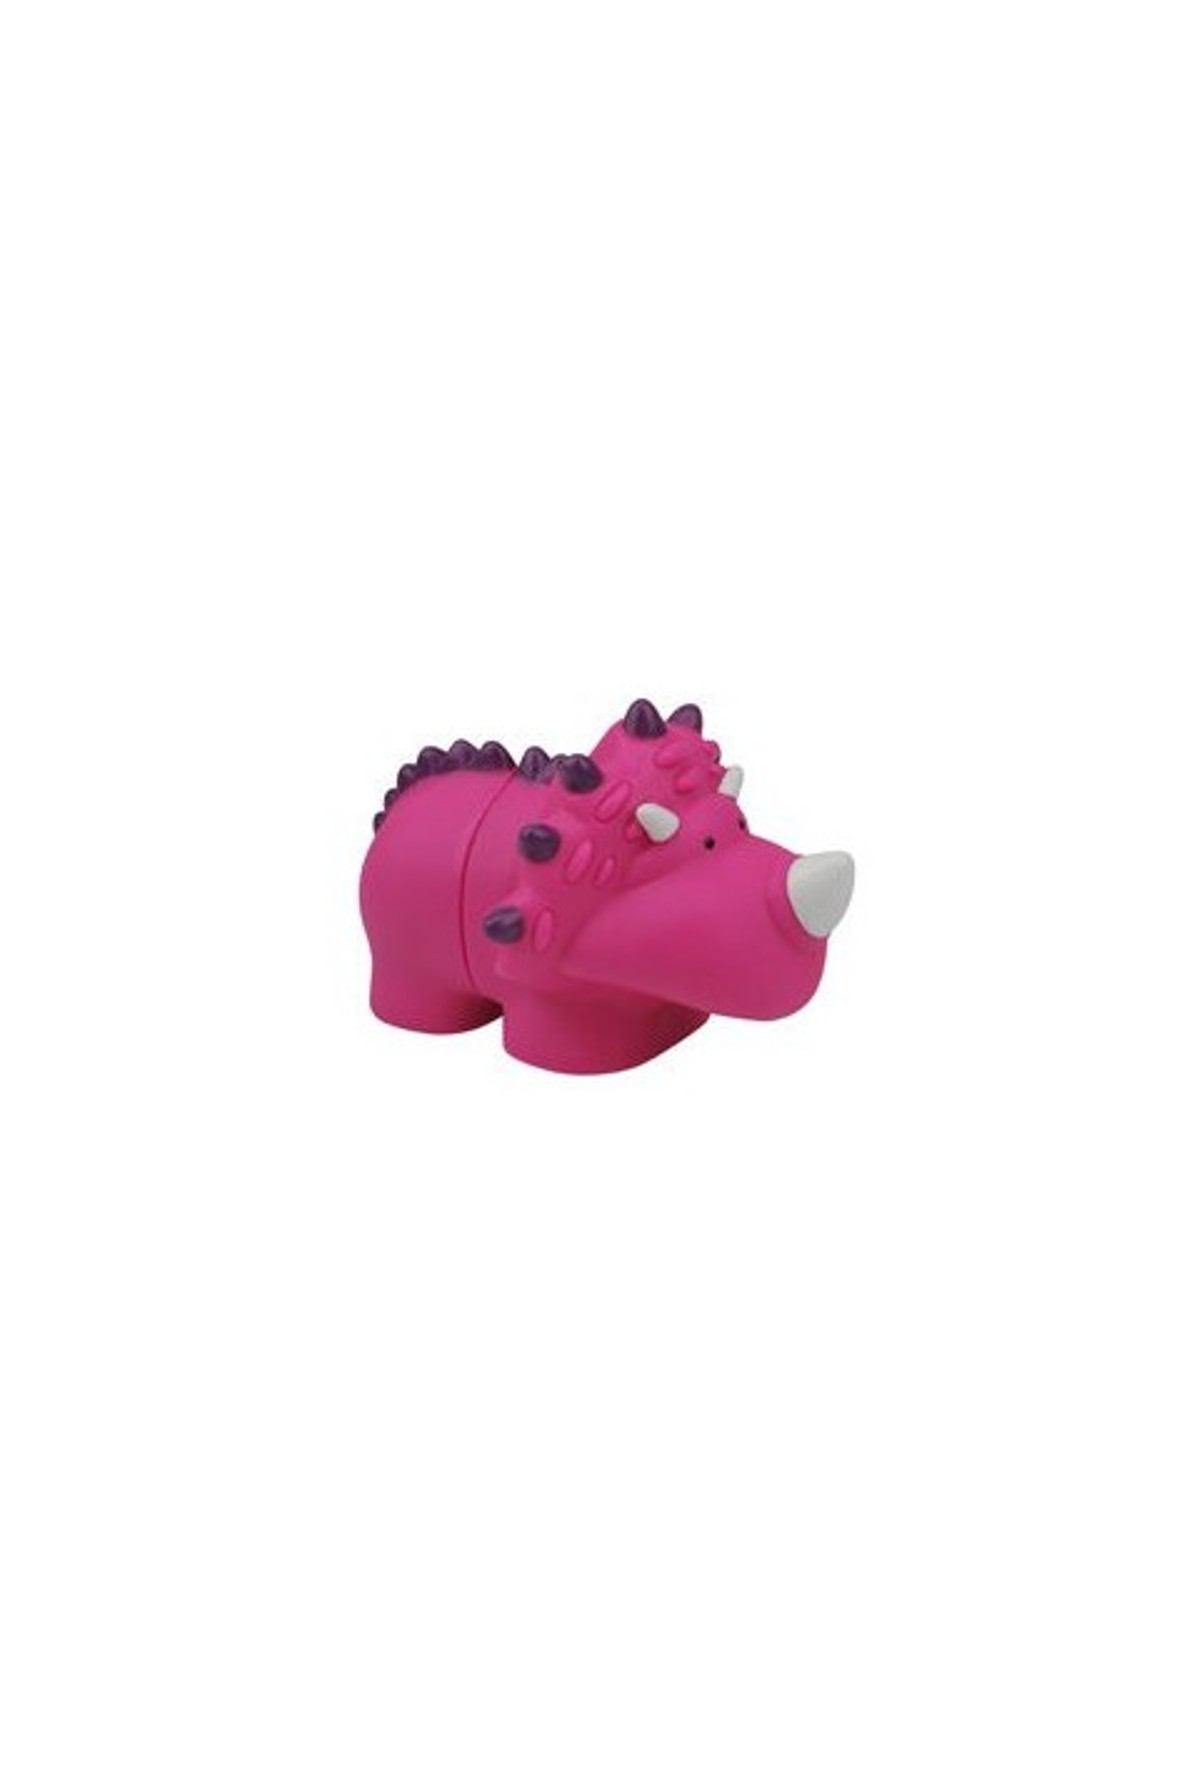 Klocki Popboblocs - Dinozaur różowy 6msc+